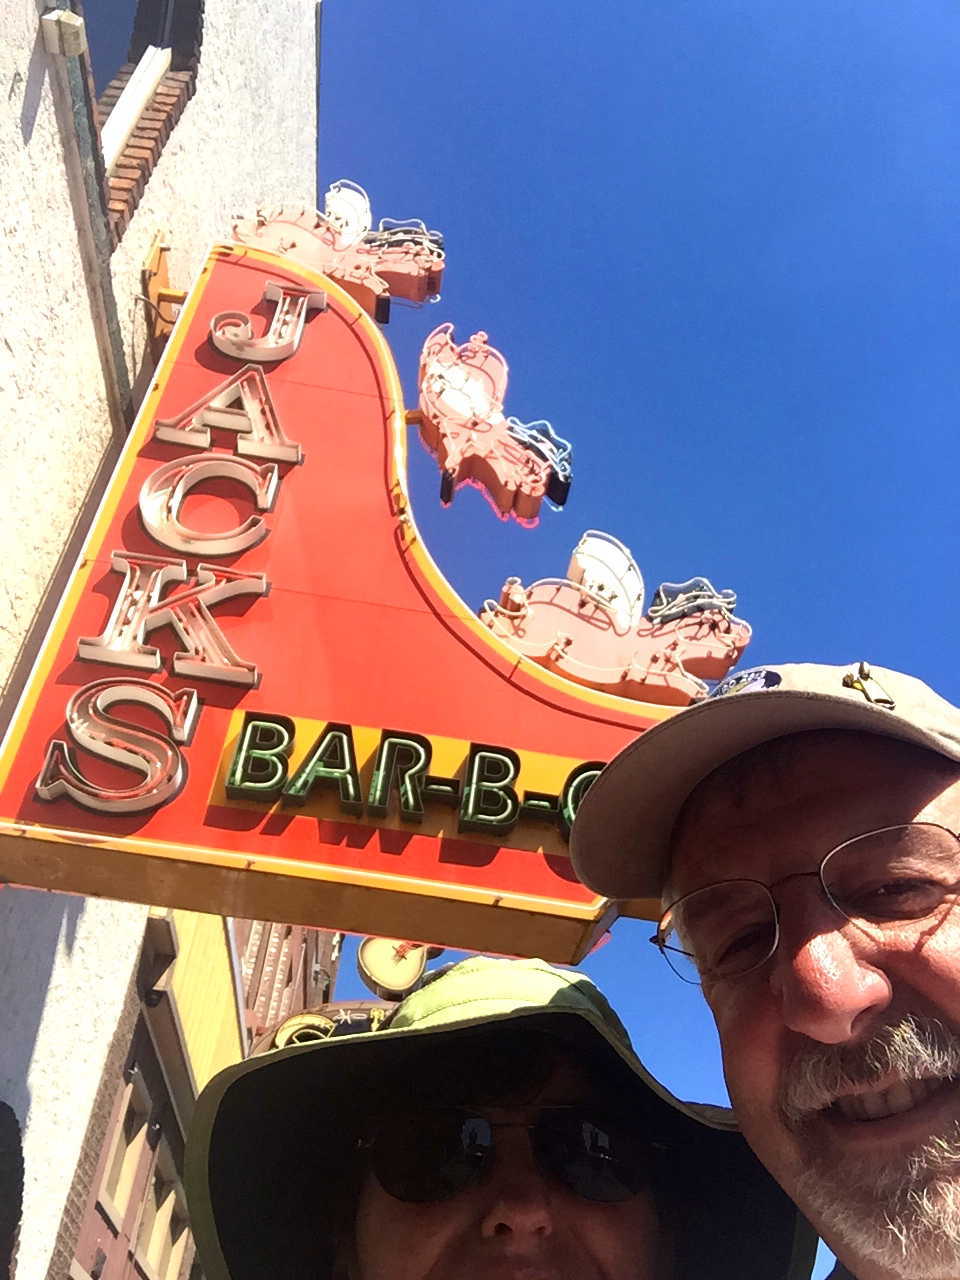 Jack's BBQ!